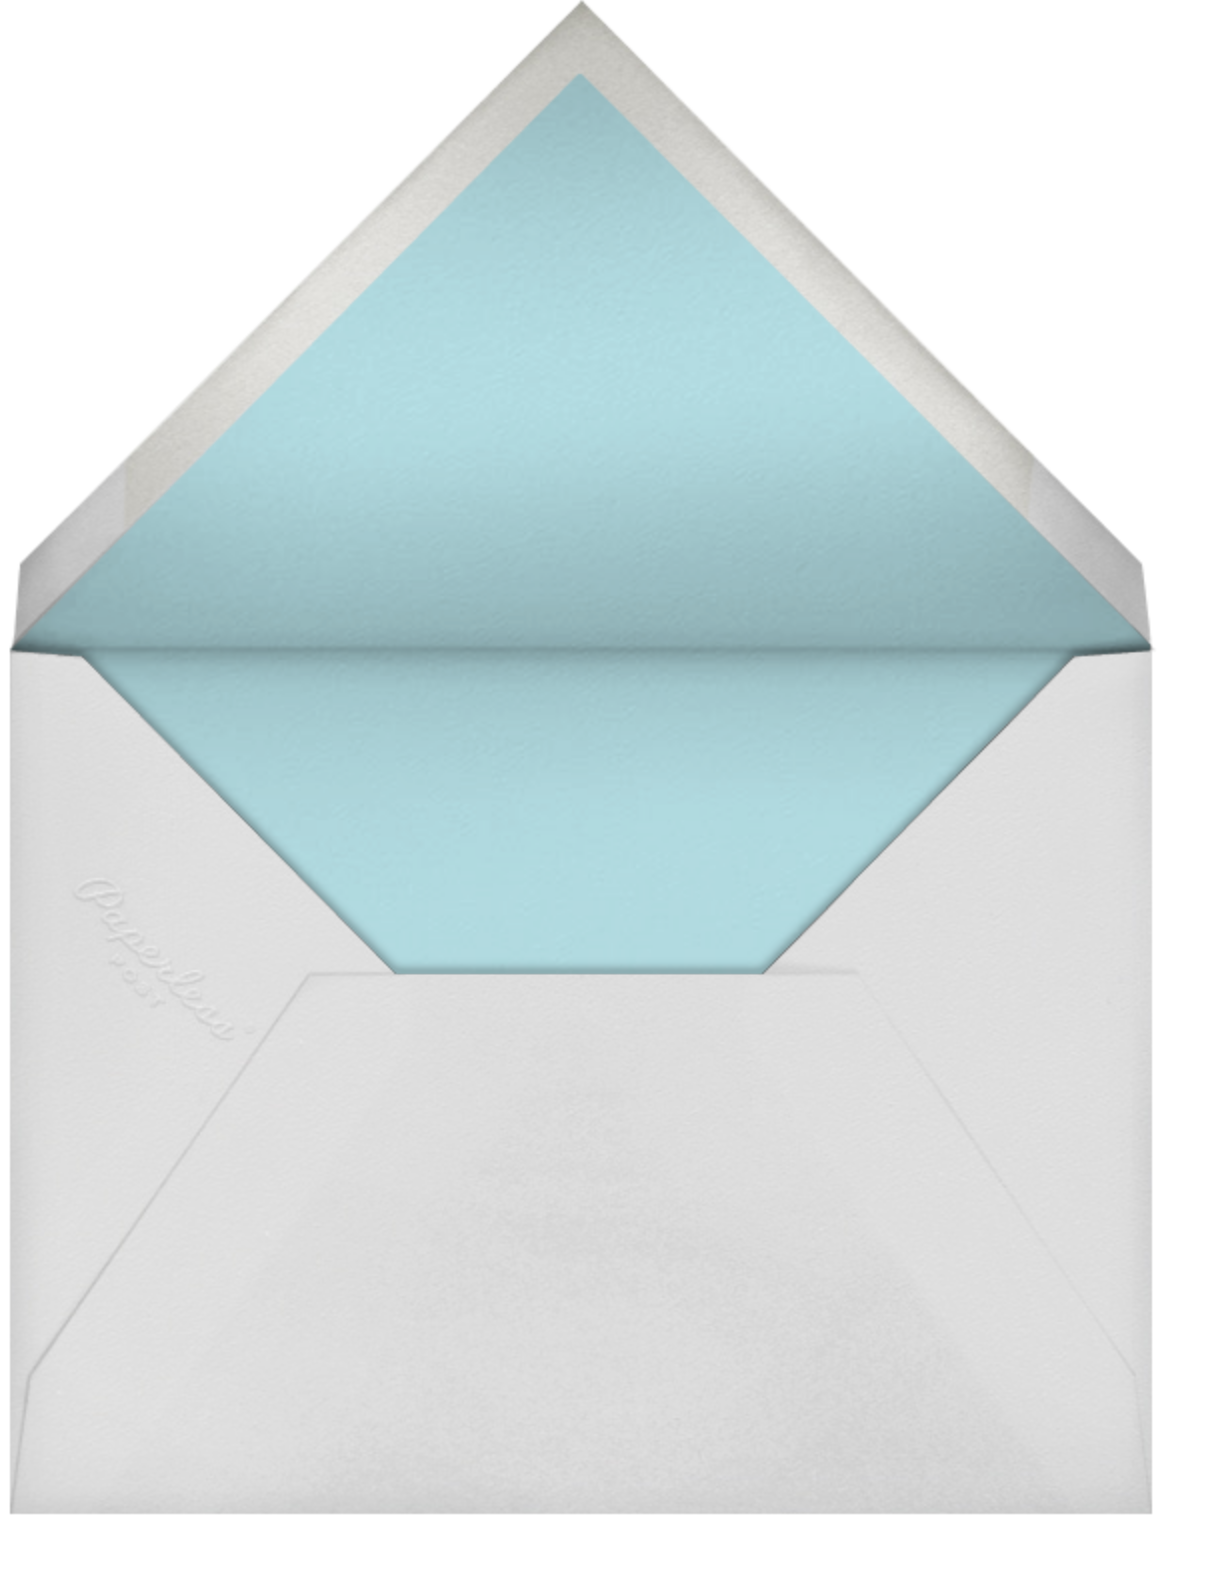 Wrapped Up Wishes (Hanukkah) - kate spade new york - Hanukkah - envelope back